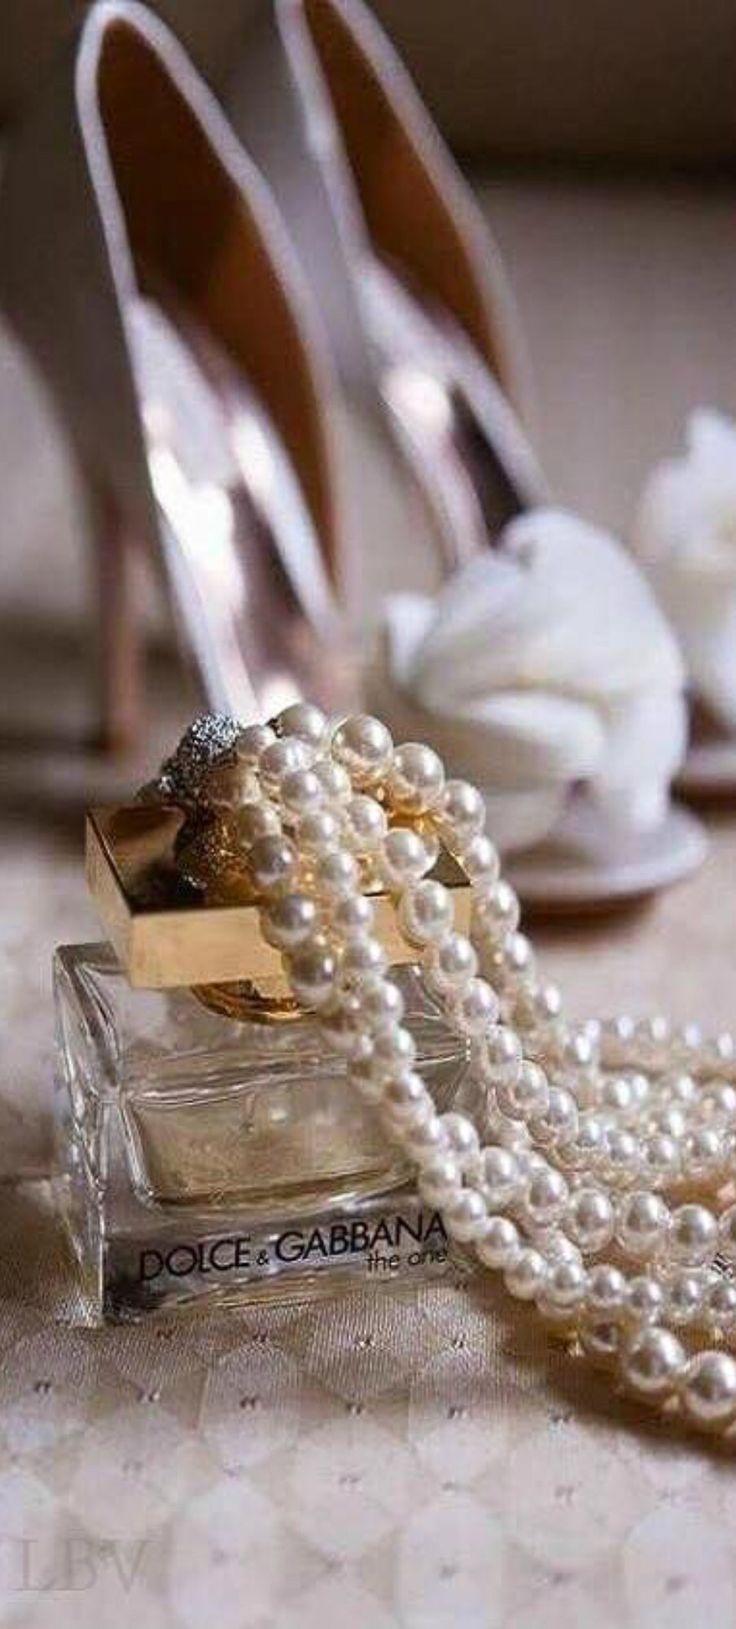 #Pearl Perfection- #Luxurydotcom